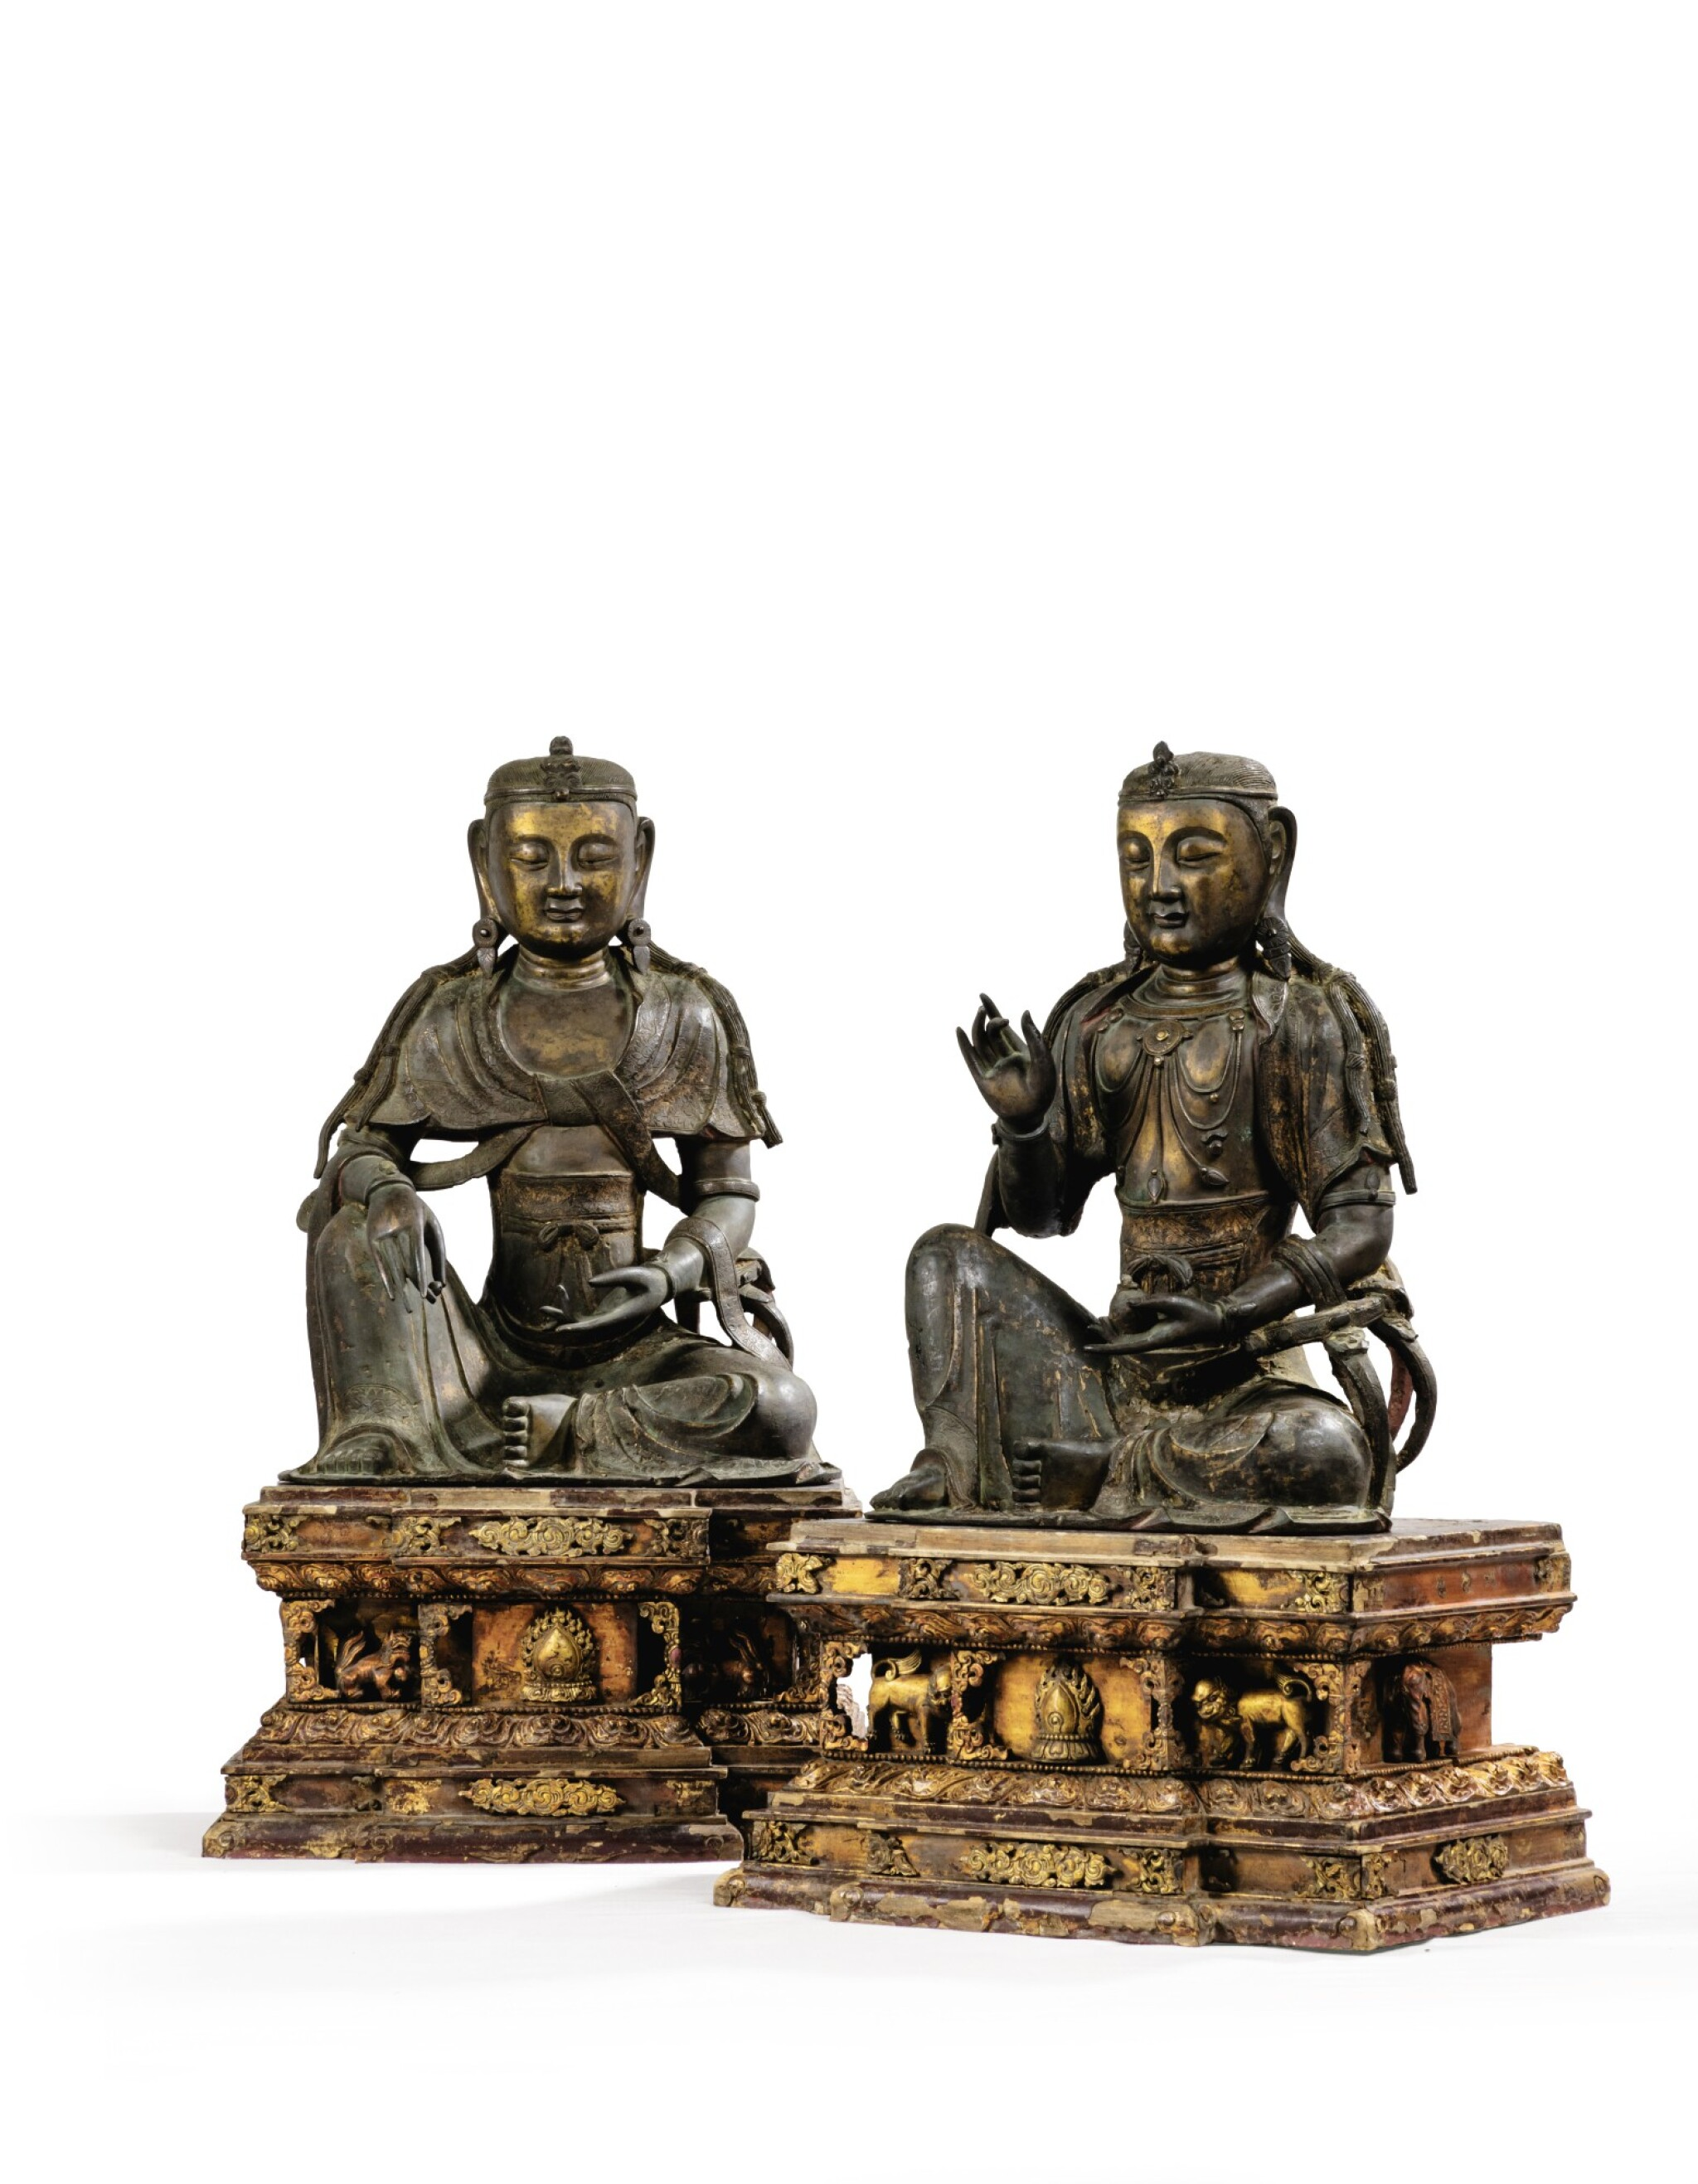 View full screen - View 1 of Lot 14. IMPORTANTE ET TRÈS RARE PAIRE DE STATUETTES DE BODHISATTVA EN BRONZE PARTIELLEMENT DORÉ XIVE SIÈCLE | 十四世紀 鎏金銅菩蕯坐像一對 連   清十八世紀 漆金木雕須彌座一對| An important and very rare pair of parcel-gilt bronze figures of Bodhisattva, 14th century; together with a pair of lacquer-gilt thrones, Qing Dynasty, 18th century.